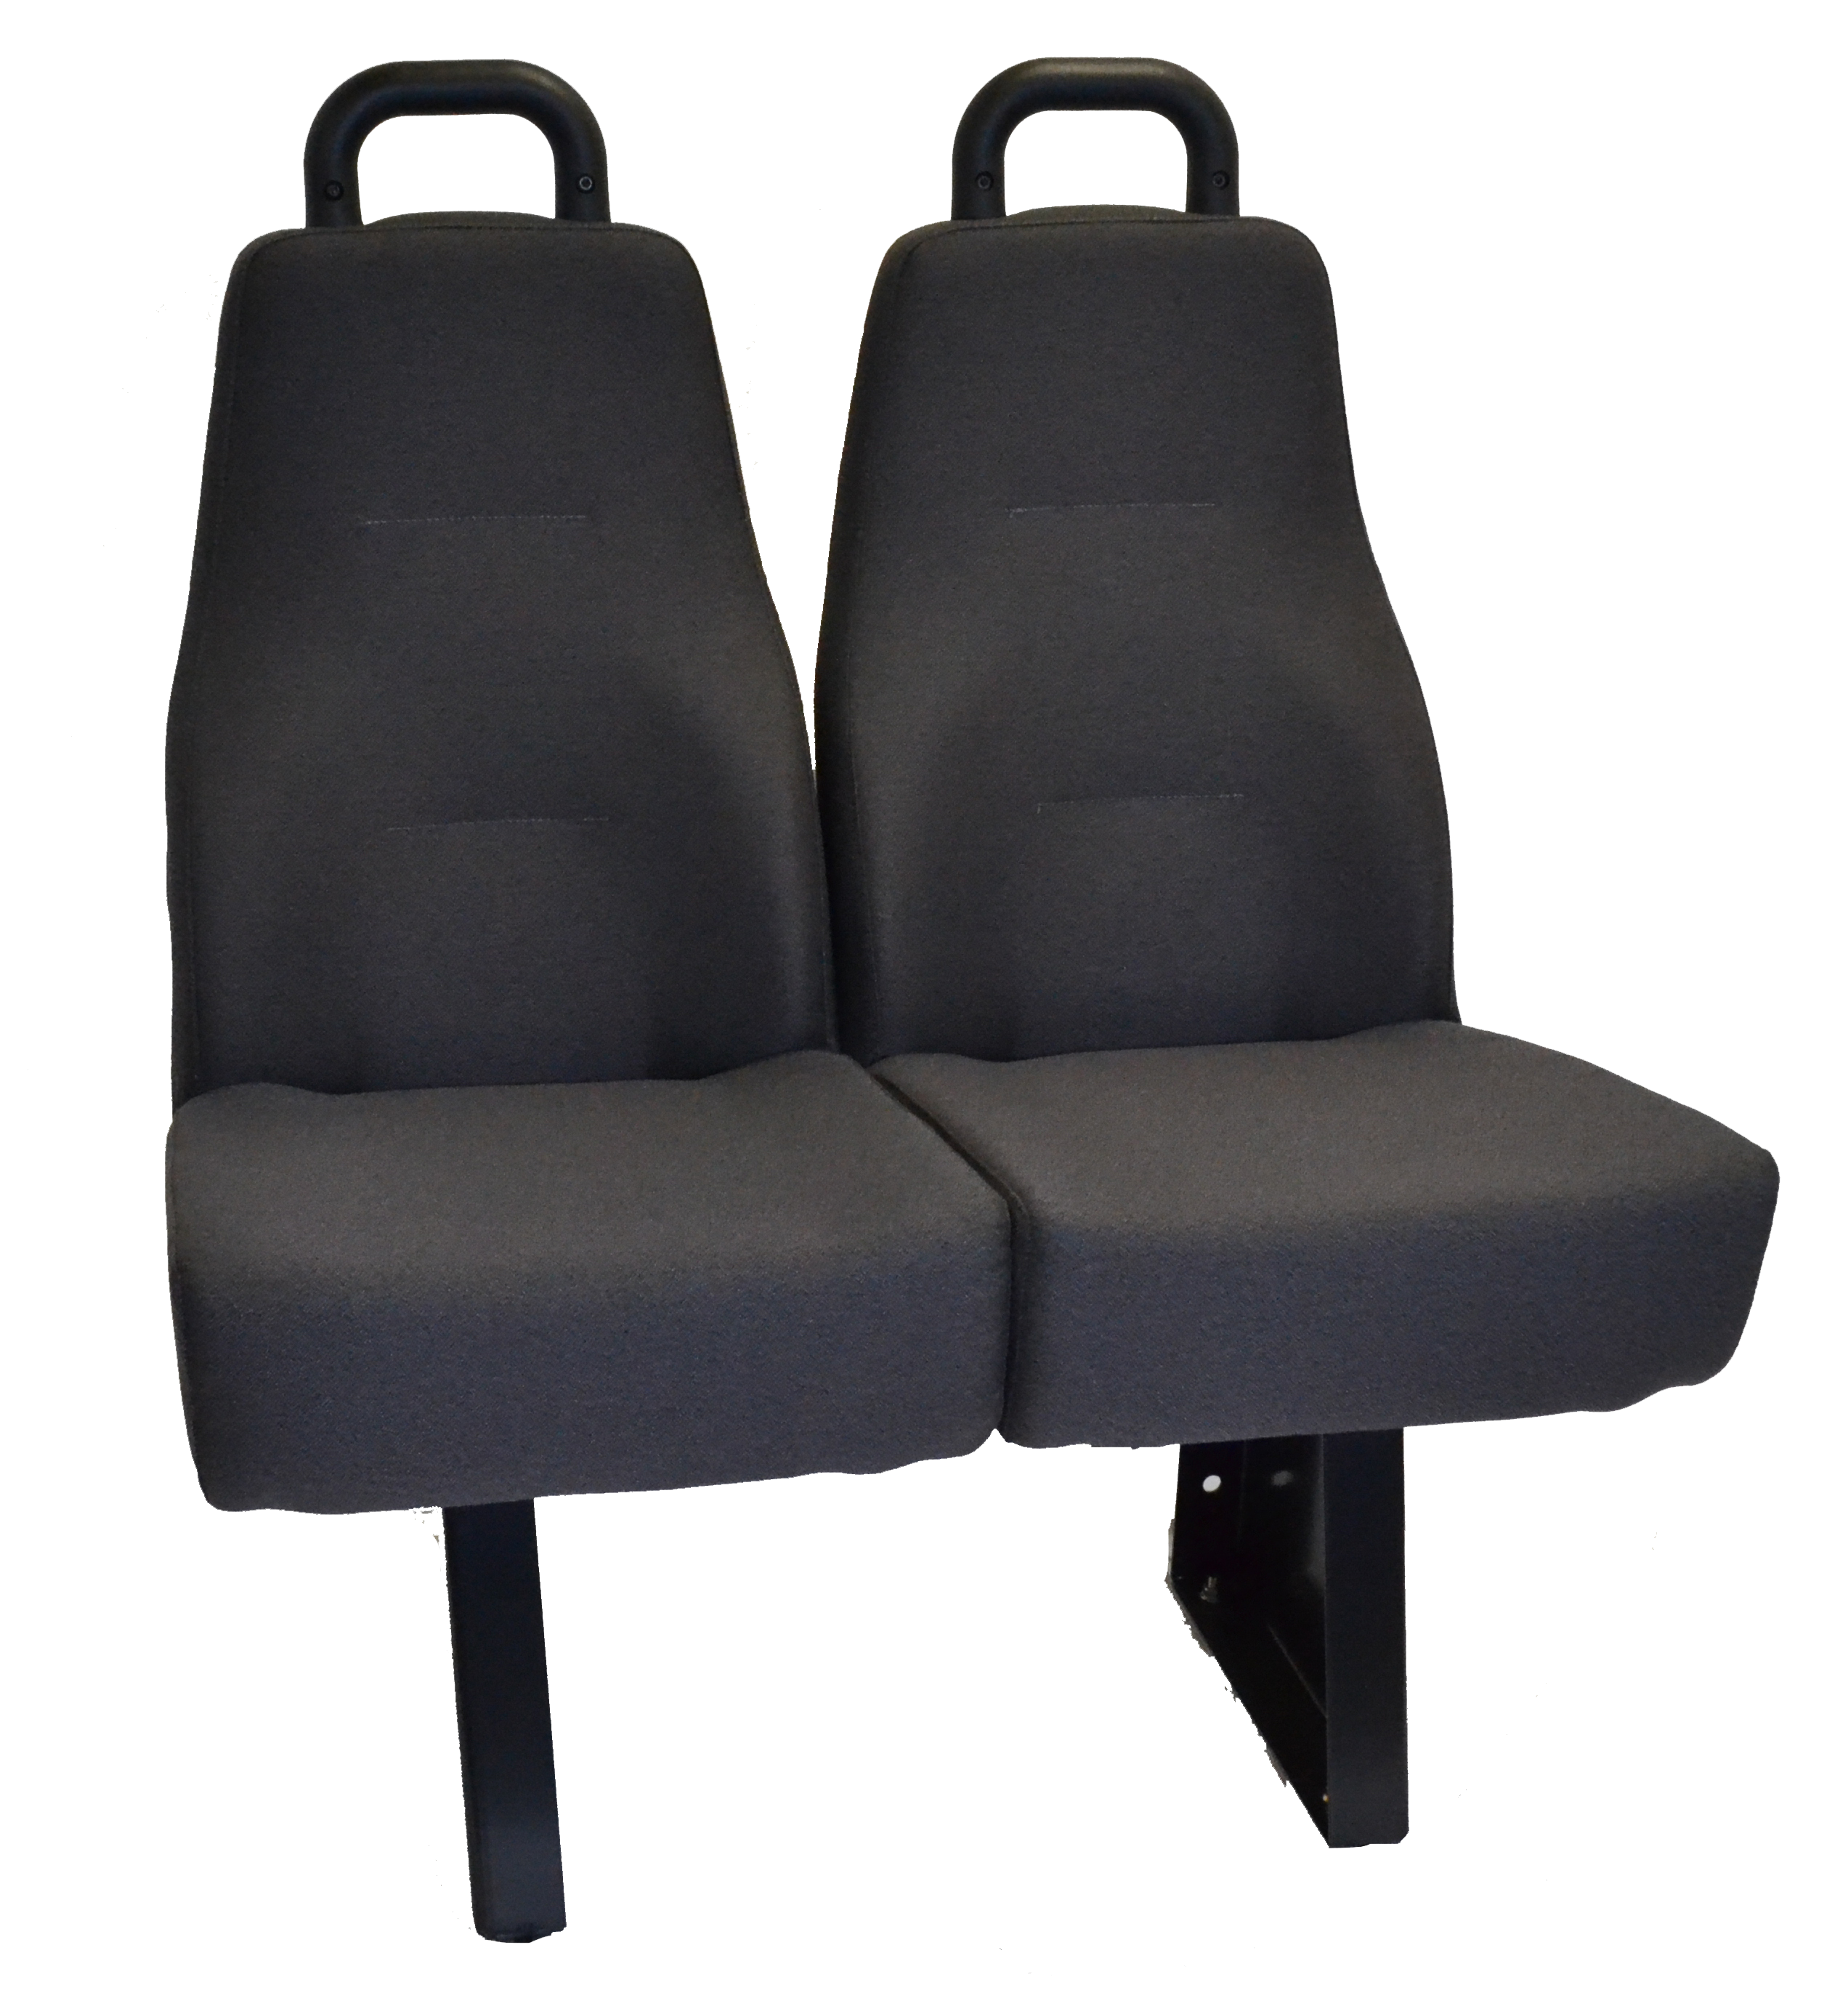 Enjoyable Feather Weight Mid Hi Seat Passenger Bus Freedman Seating Co Download Free Architecture Designs Scobabritishbridgeorg